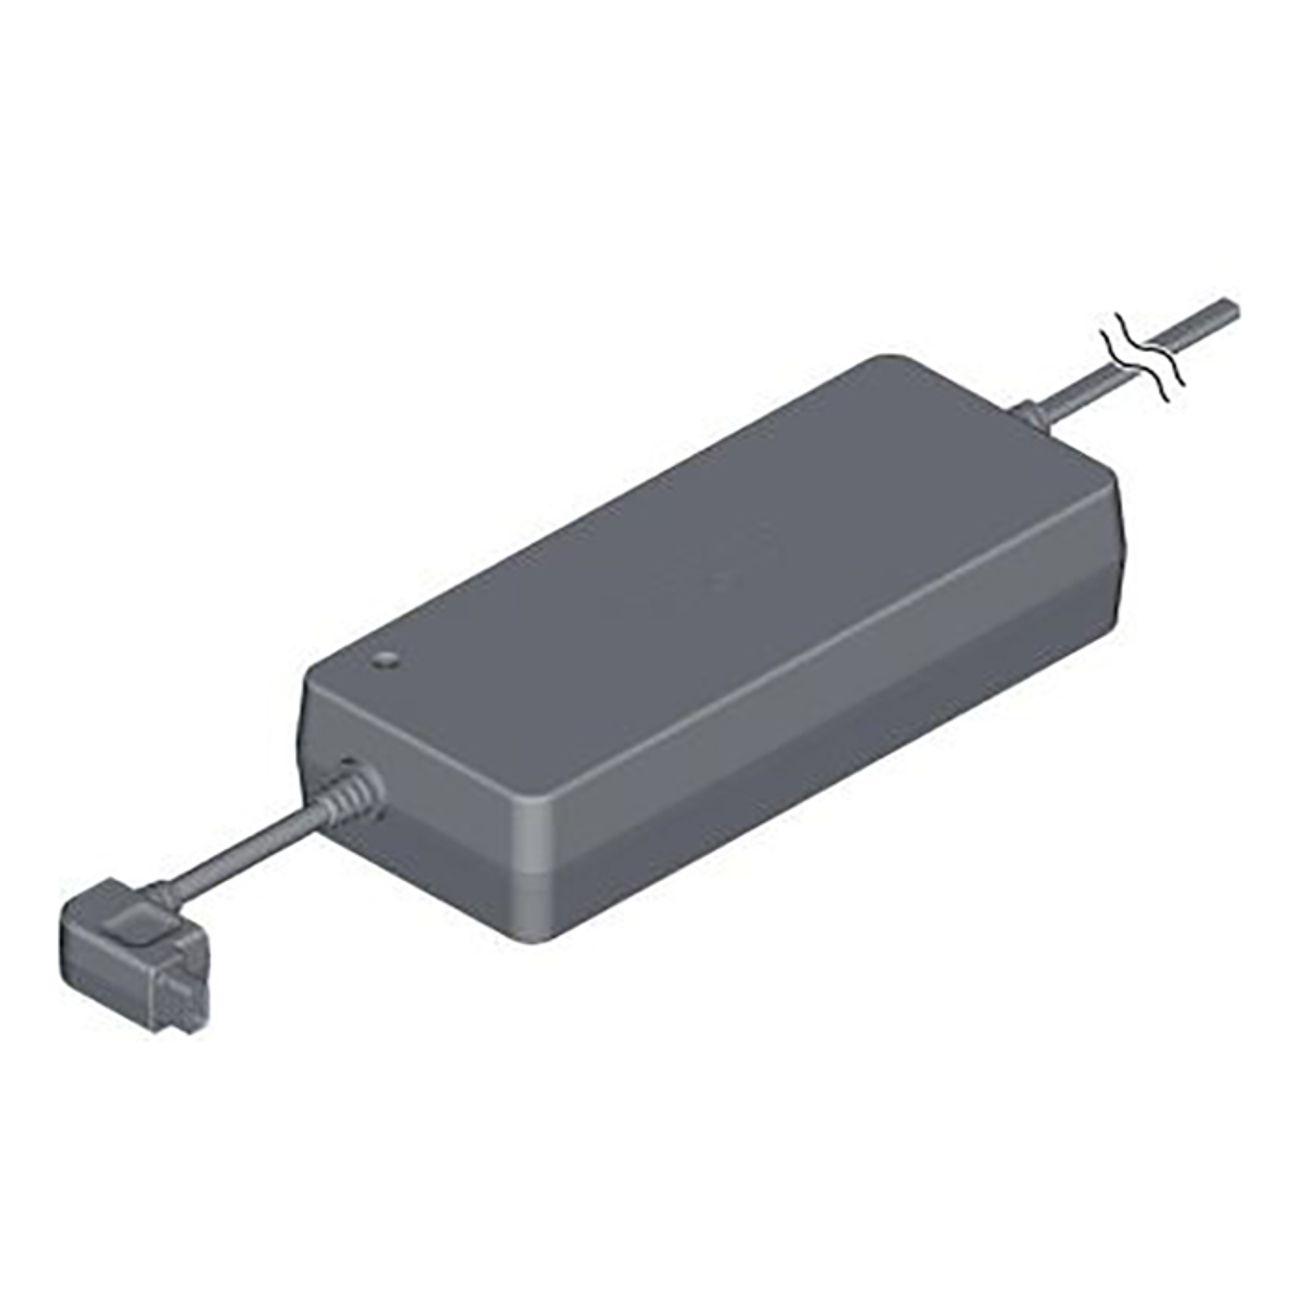 SHIMANO Chargeur de batterie Shimano Steps E6/8